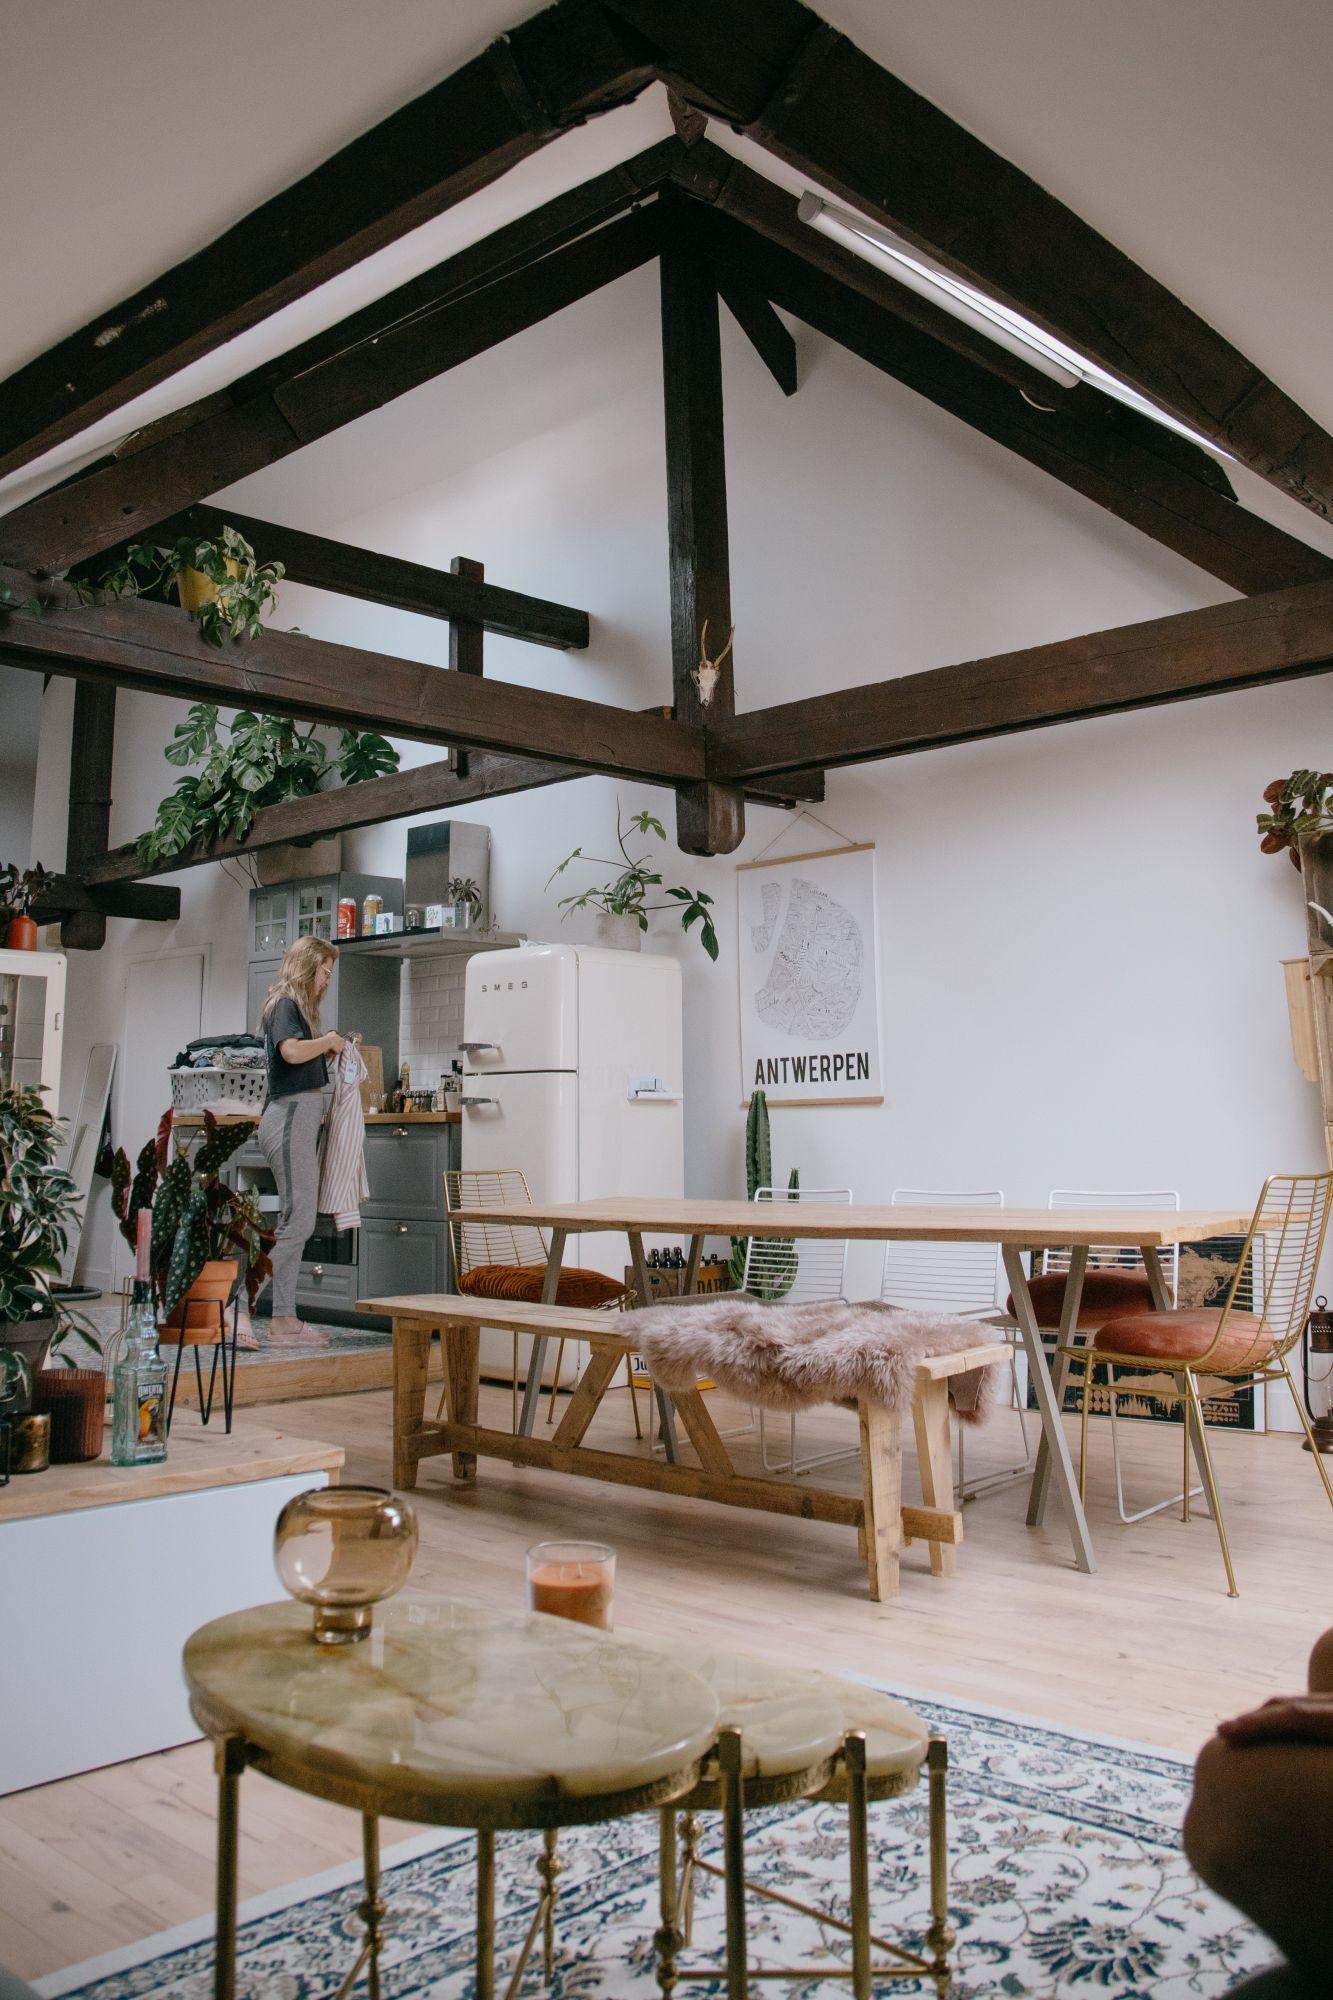 Stile bohemian jungle e arredi eclettici